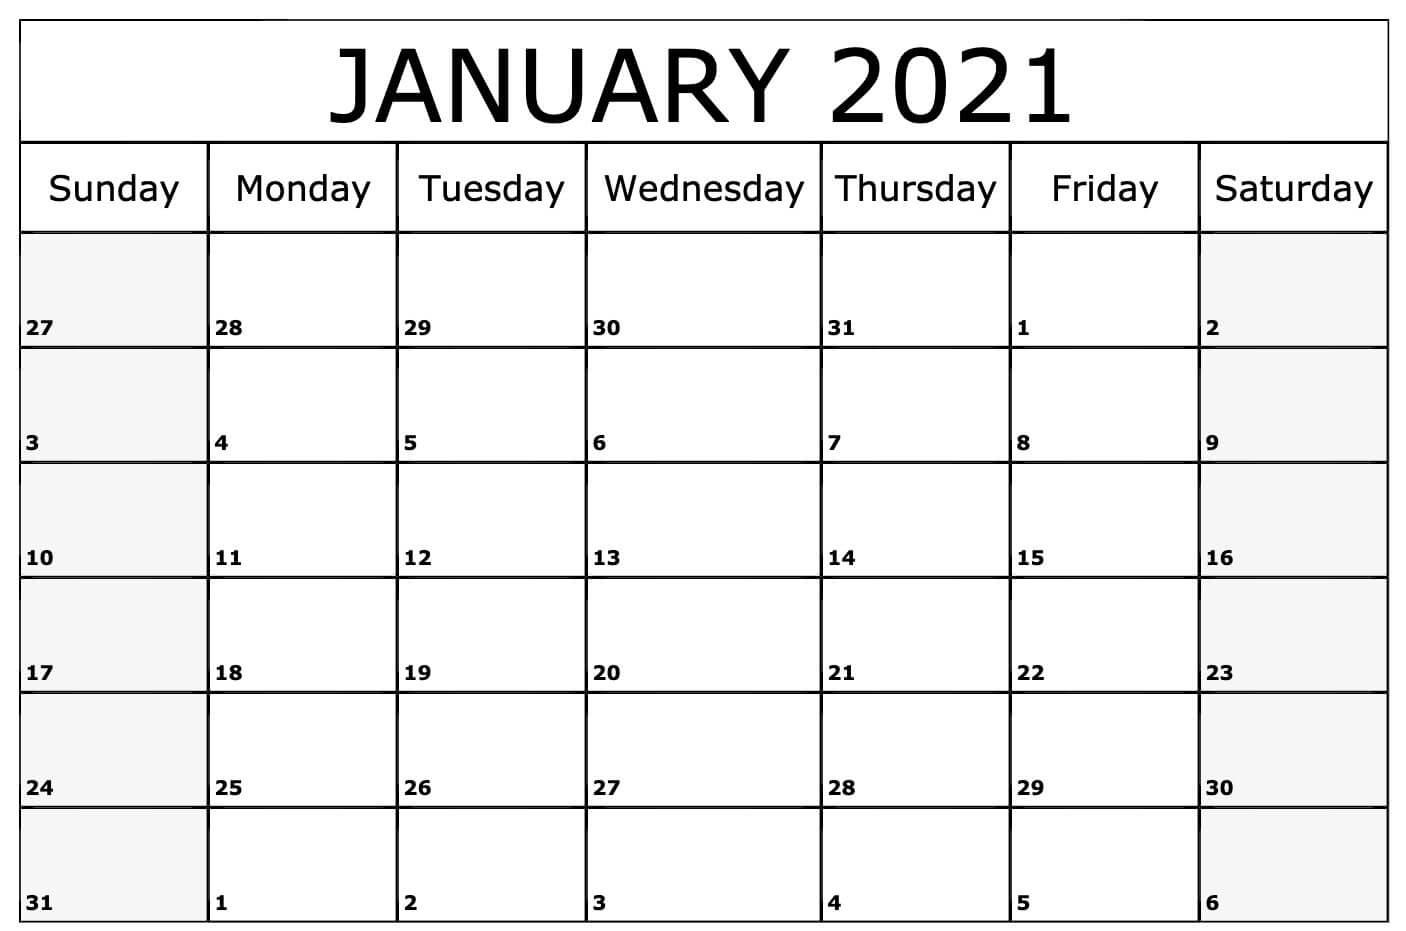 Blank January 2021 Calendar Pdf, Word, Excel Template for Desktop Calendars 2021 Free Printable